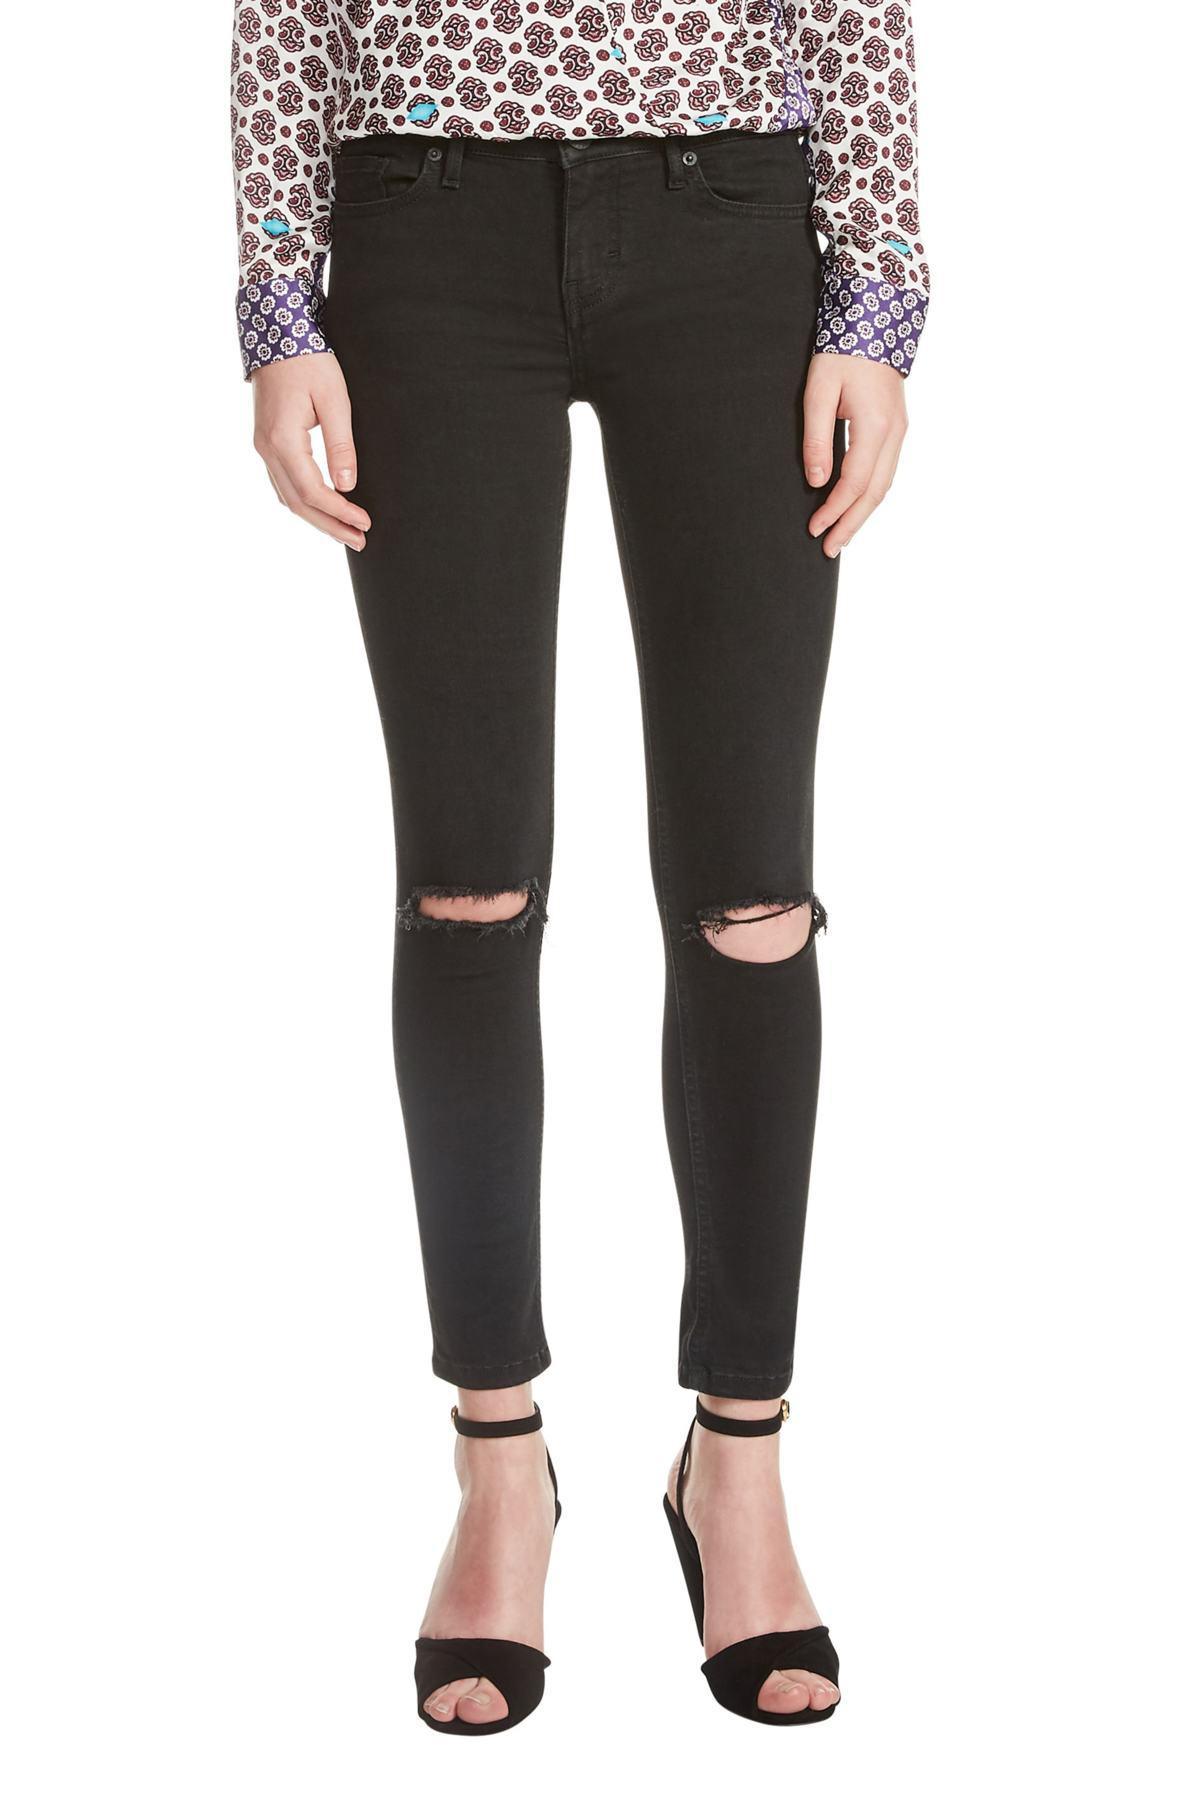 c1e362515f5 Lyst - Maje Priska Ripped Bee Embroidery Black Skinny Jeans in Black